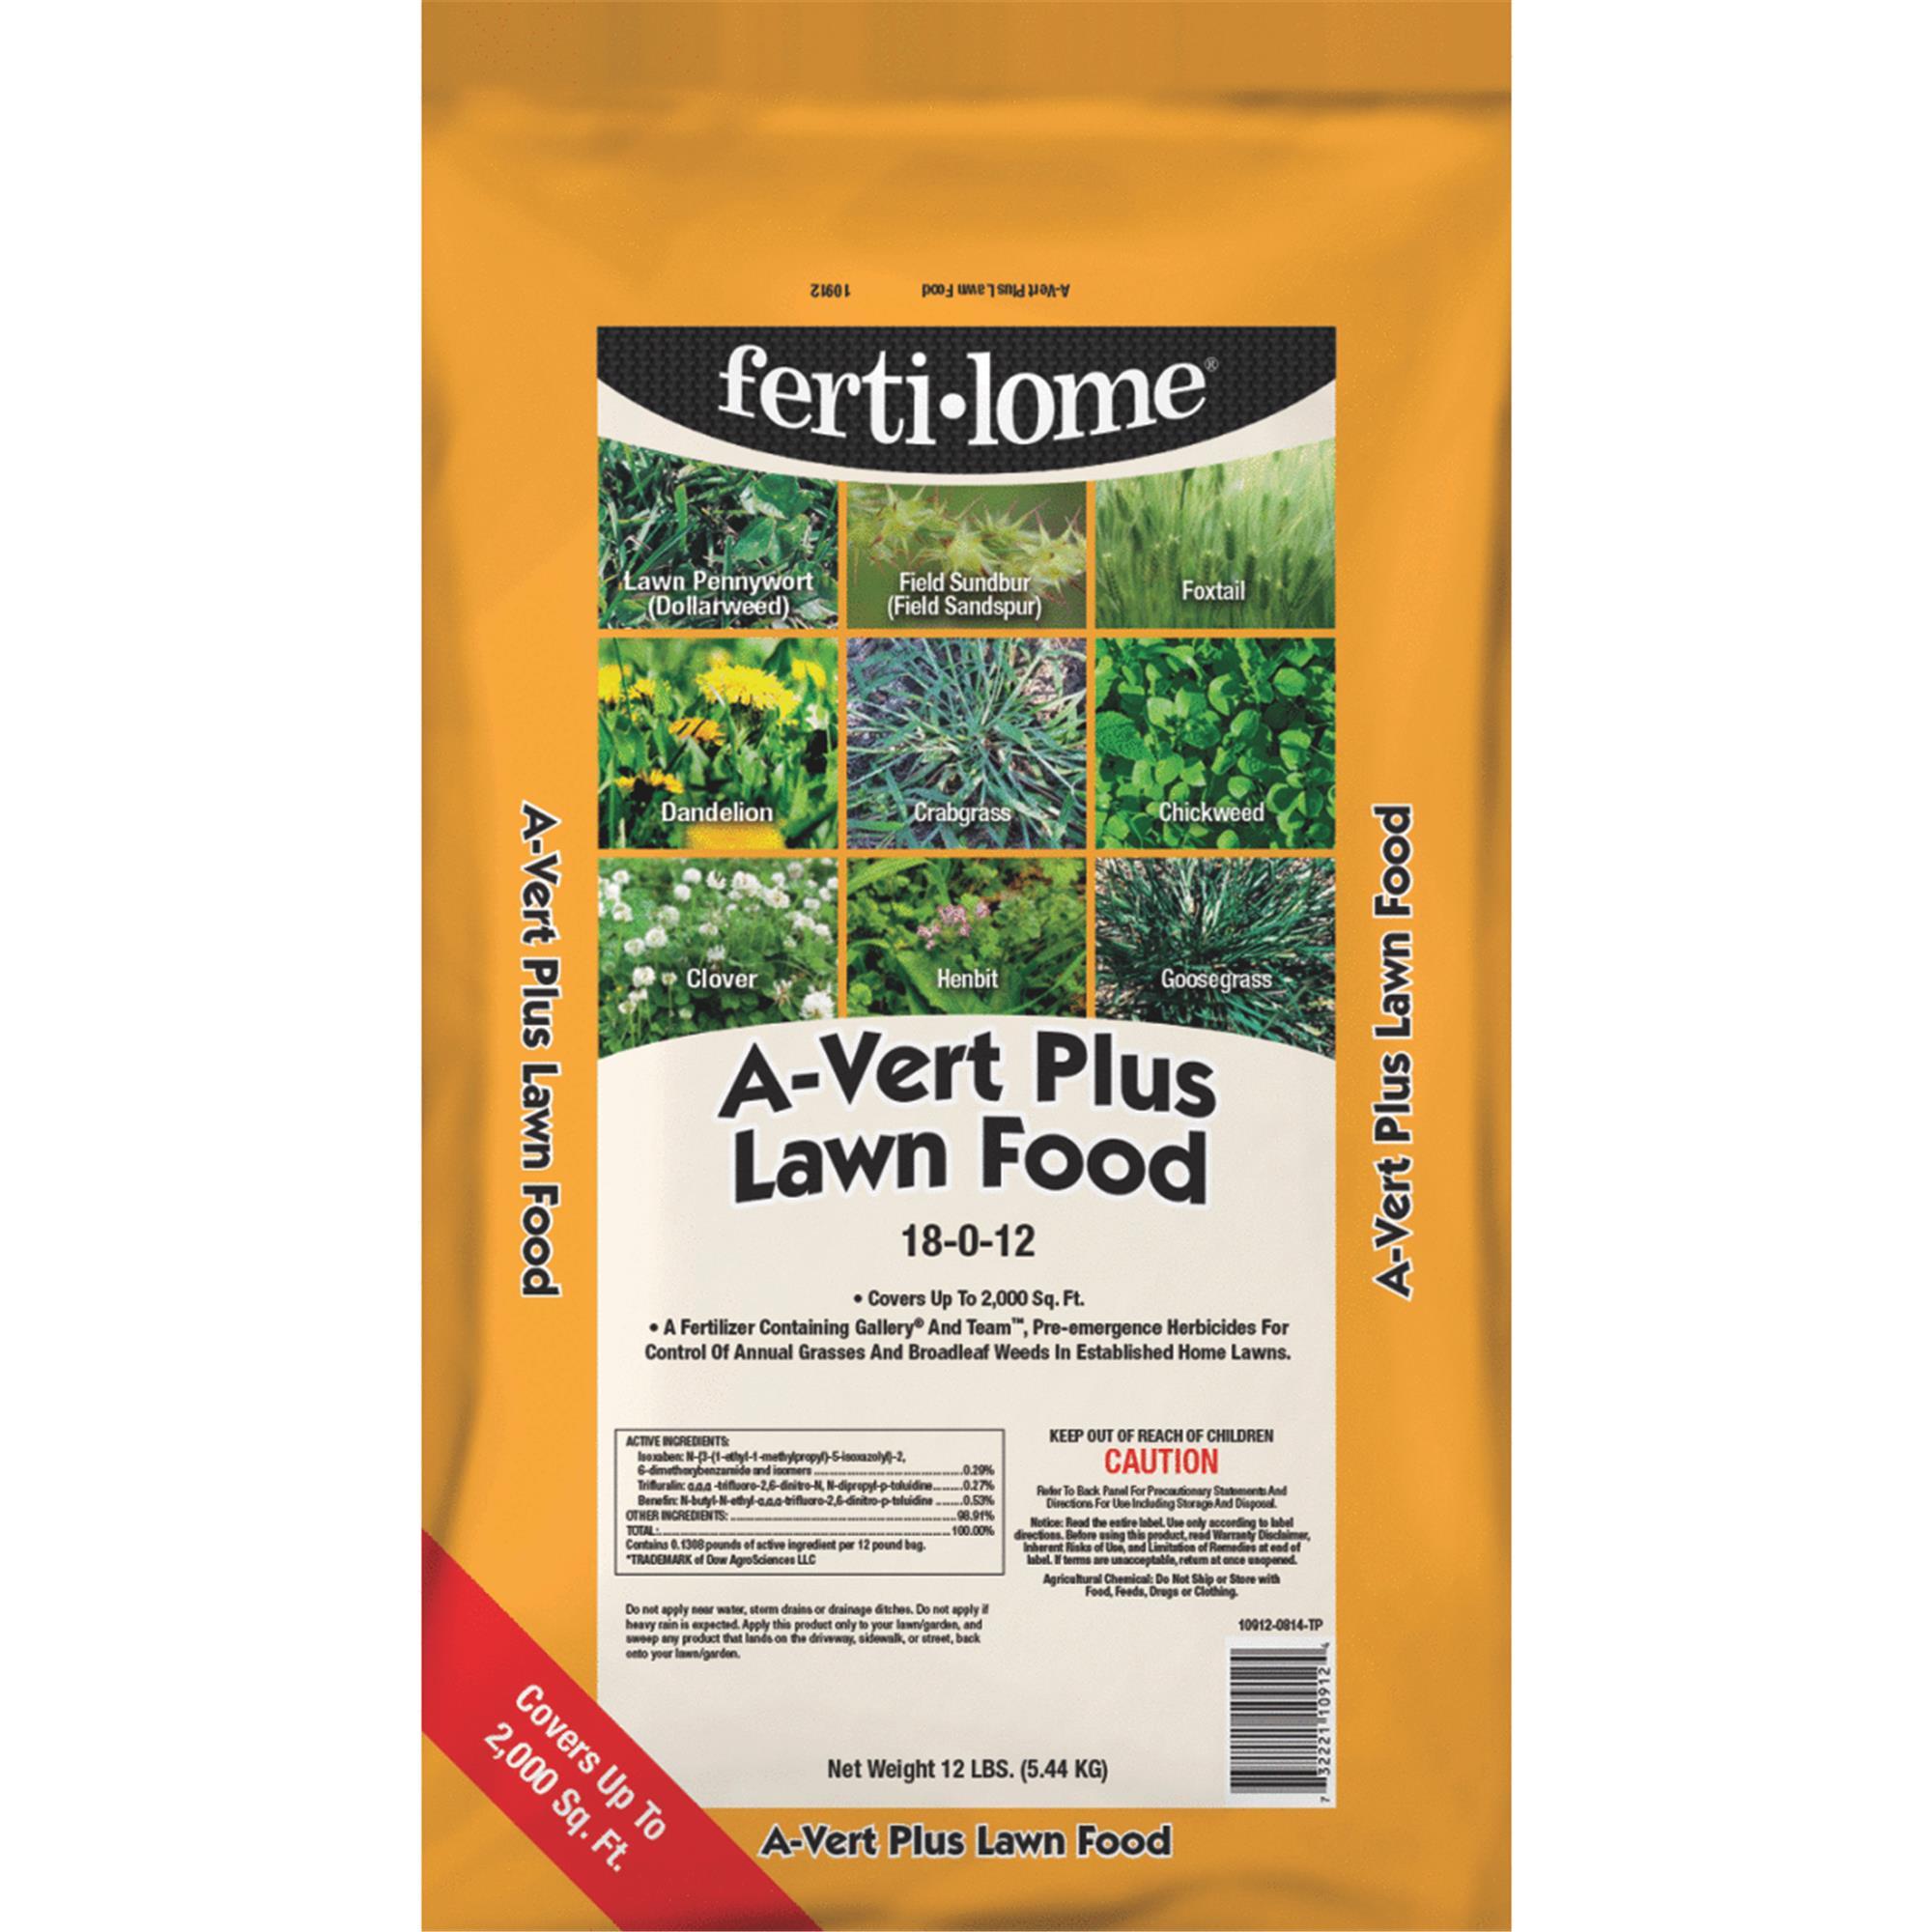 Ferti-lome A-Vert Plus Lawn Fertilizer With Weed Killer